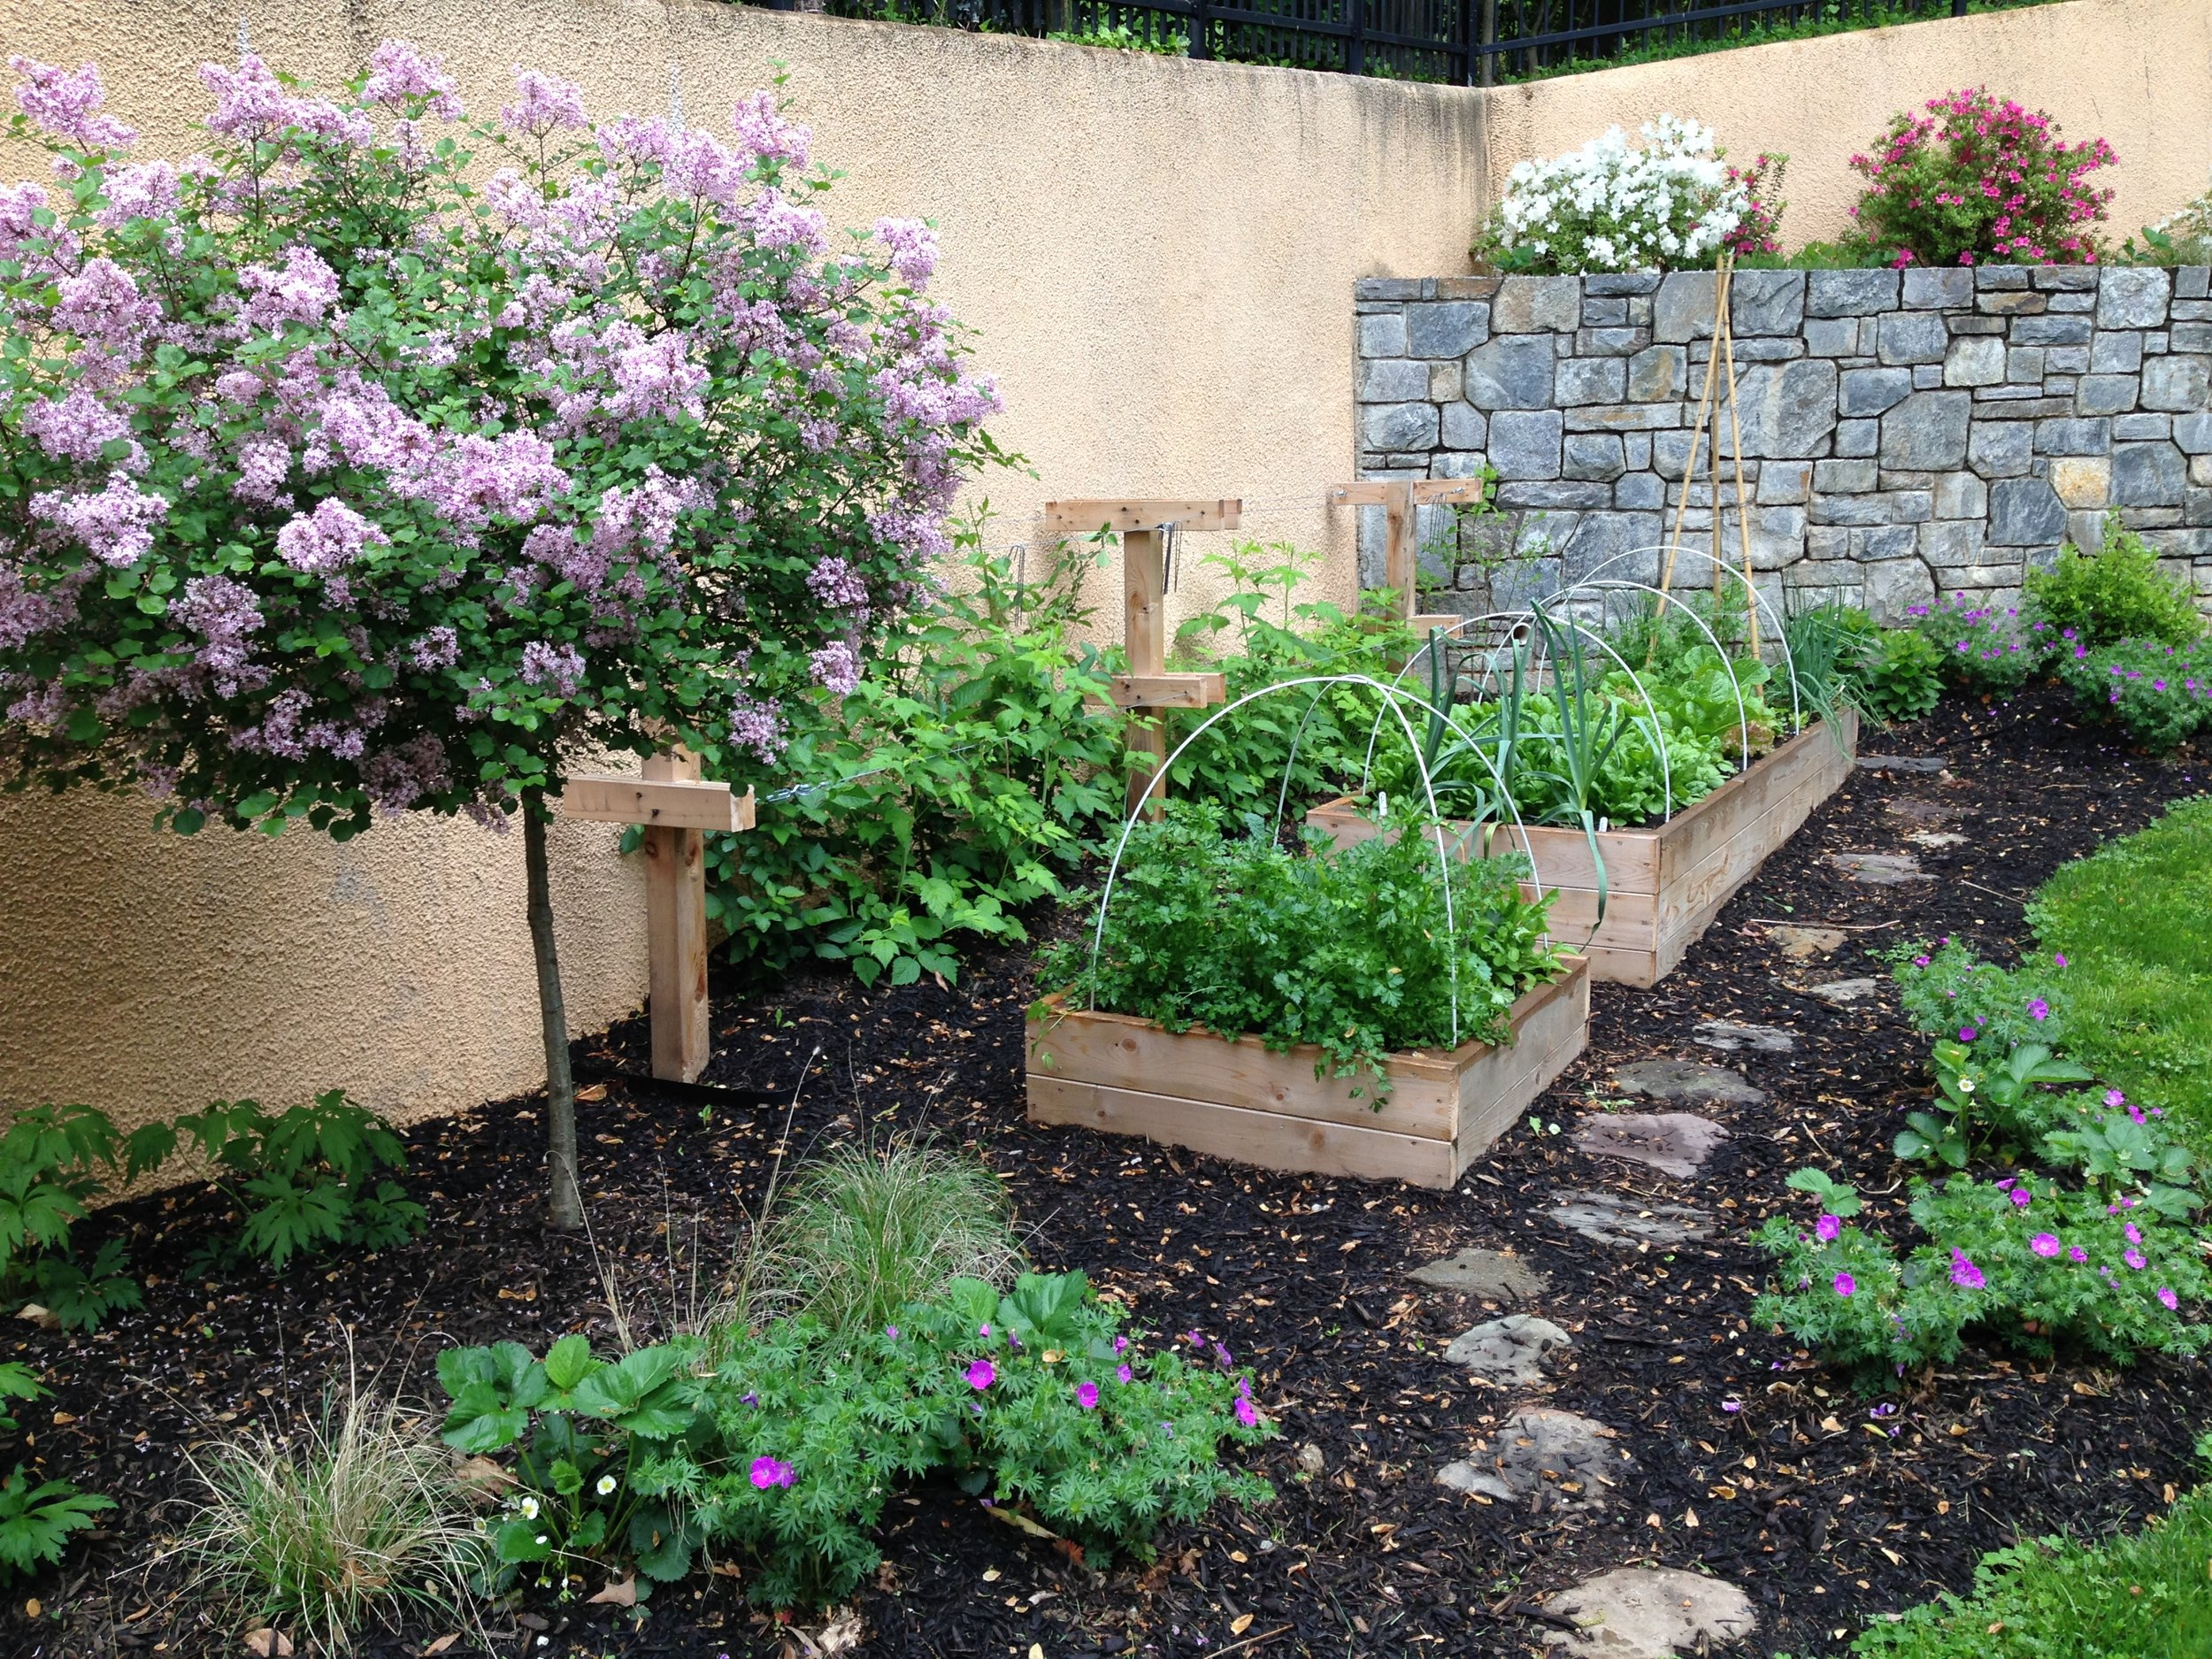 Raised Bed Garden, Blackberry Trellis, Stone Pathway, Mulching